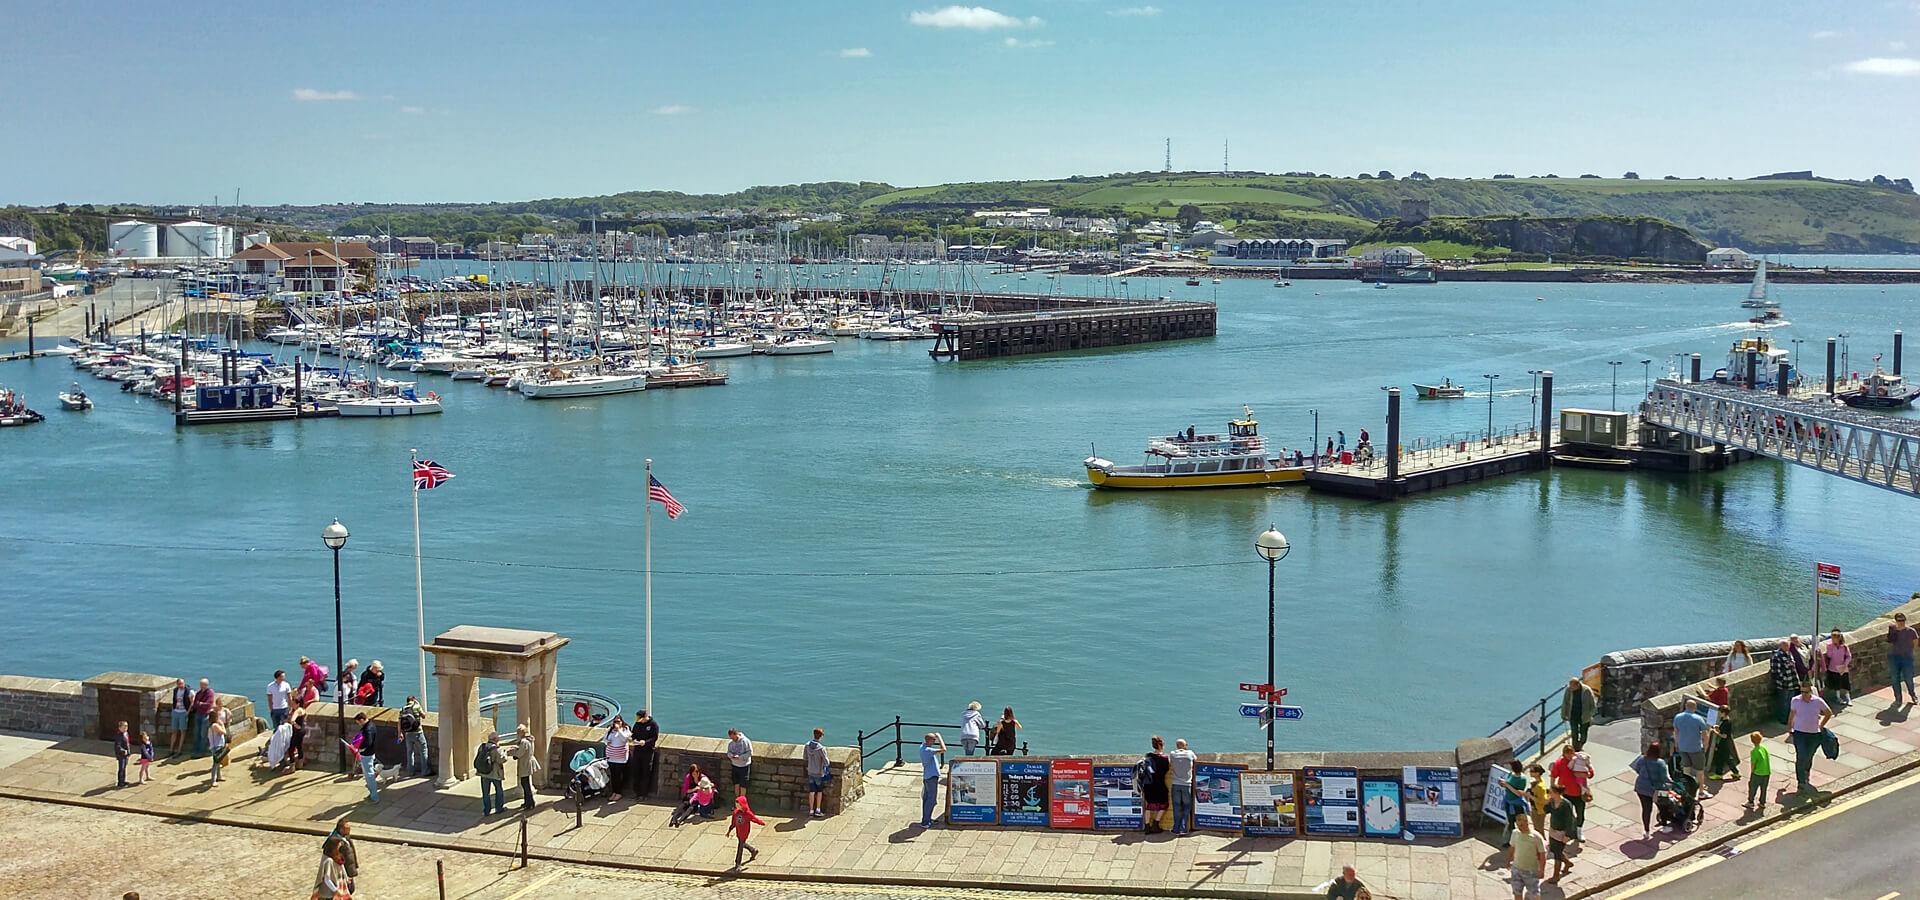 Plymouth-City-Breaks-Plymouth-Barbican-Mayflower-Steps-uk-2020.jpg